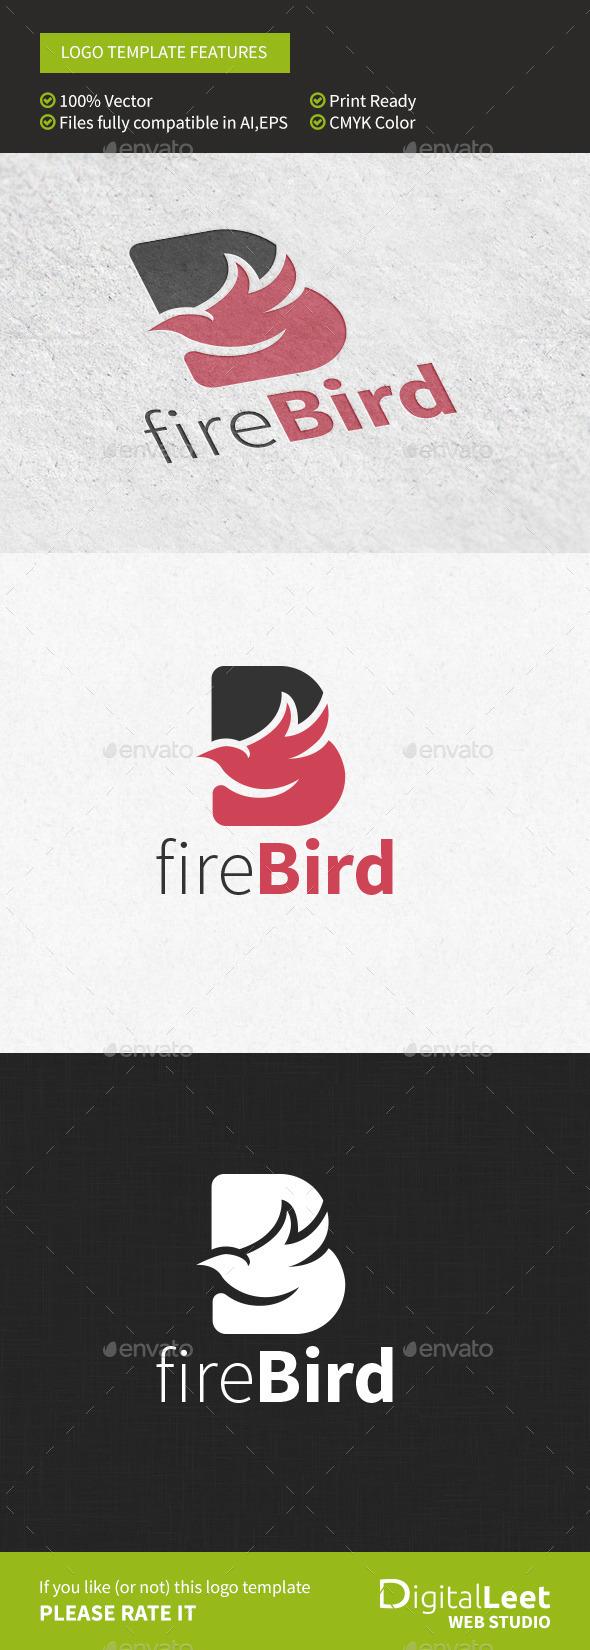 GraphicRiver Firebird B Letter Logo template 9576047